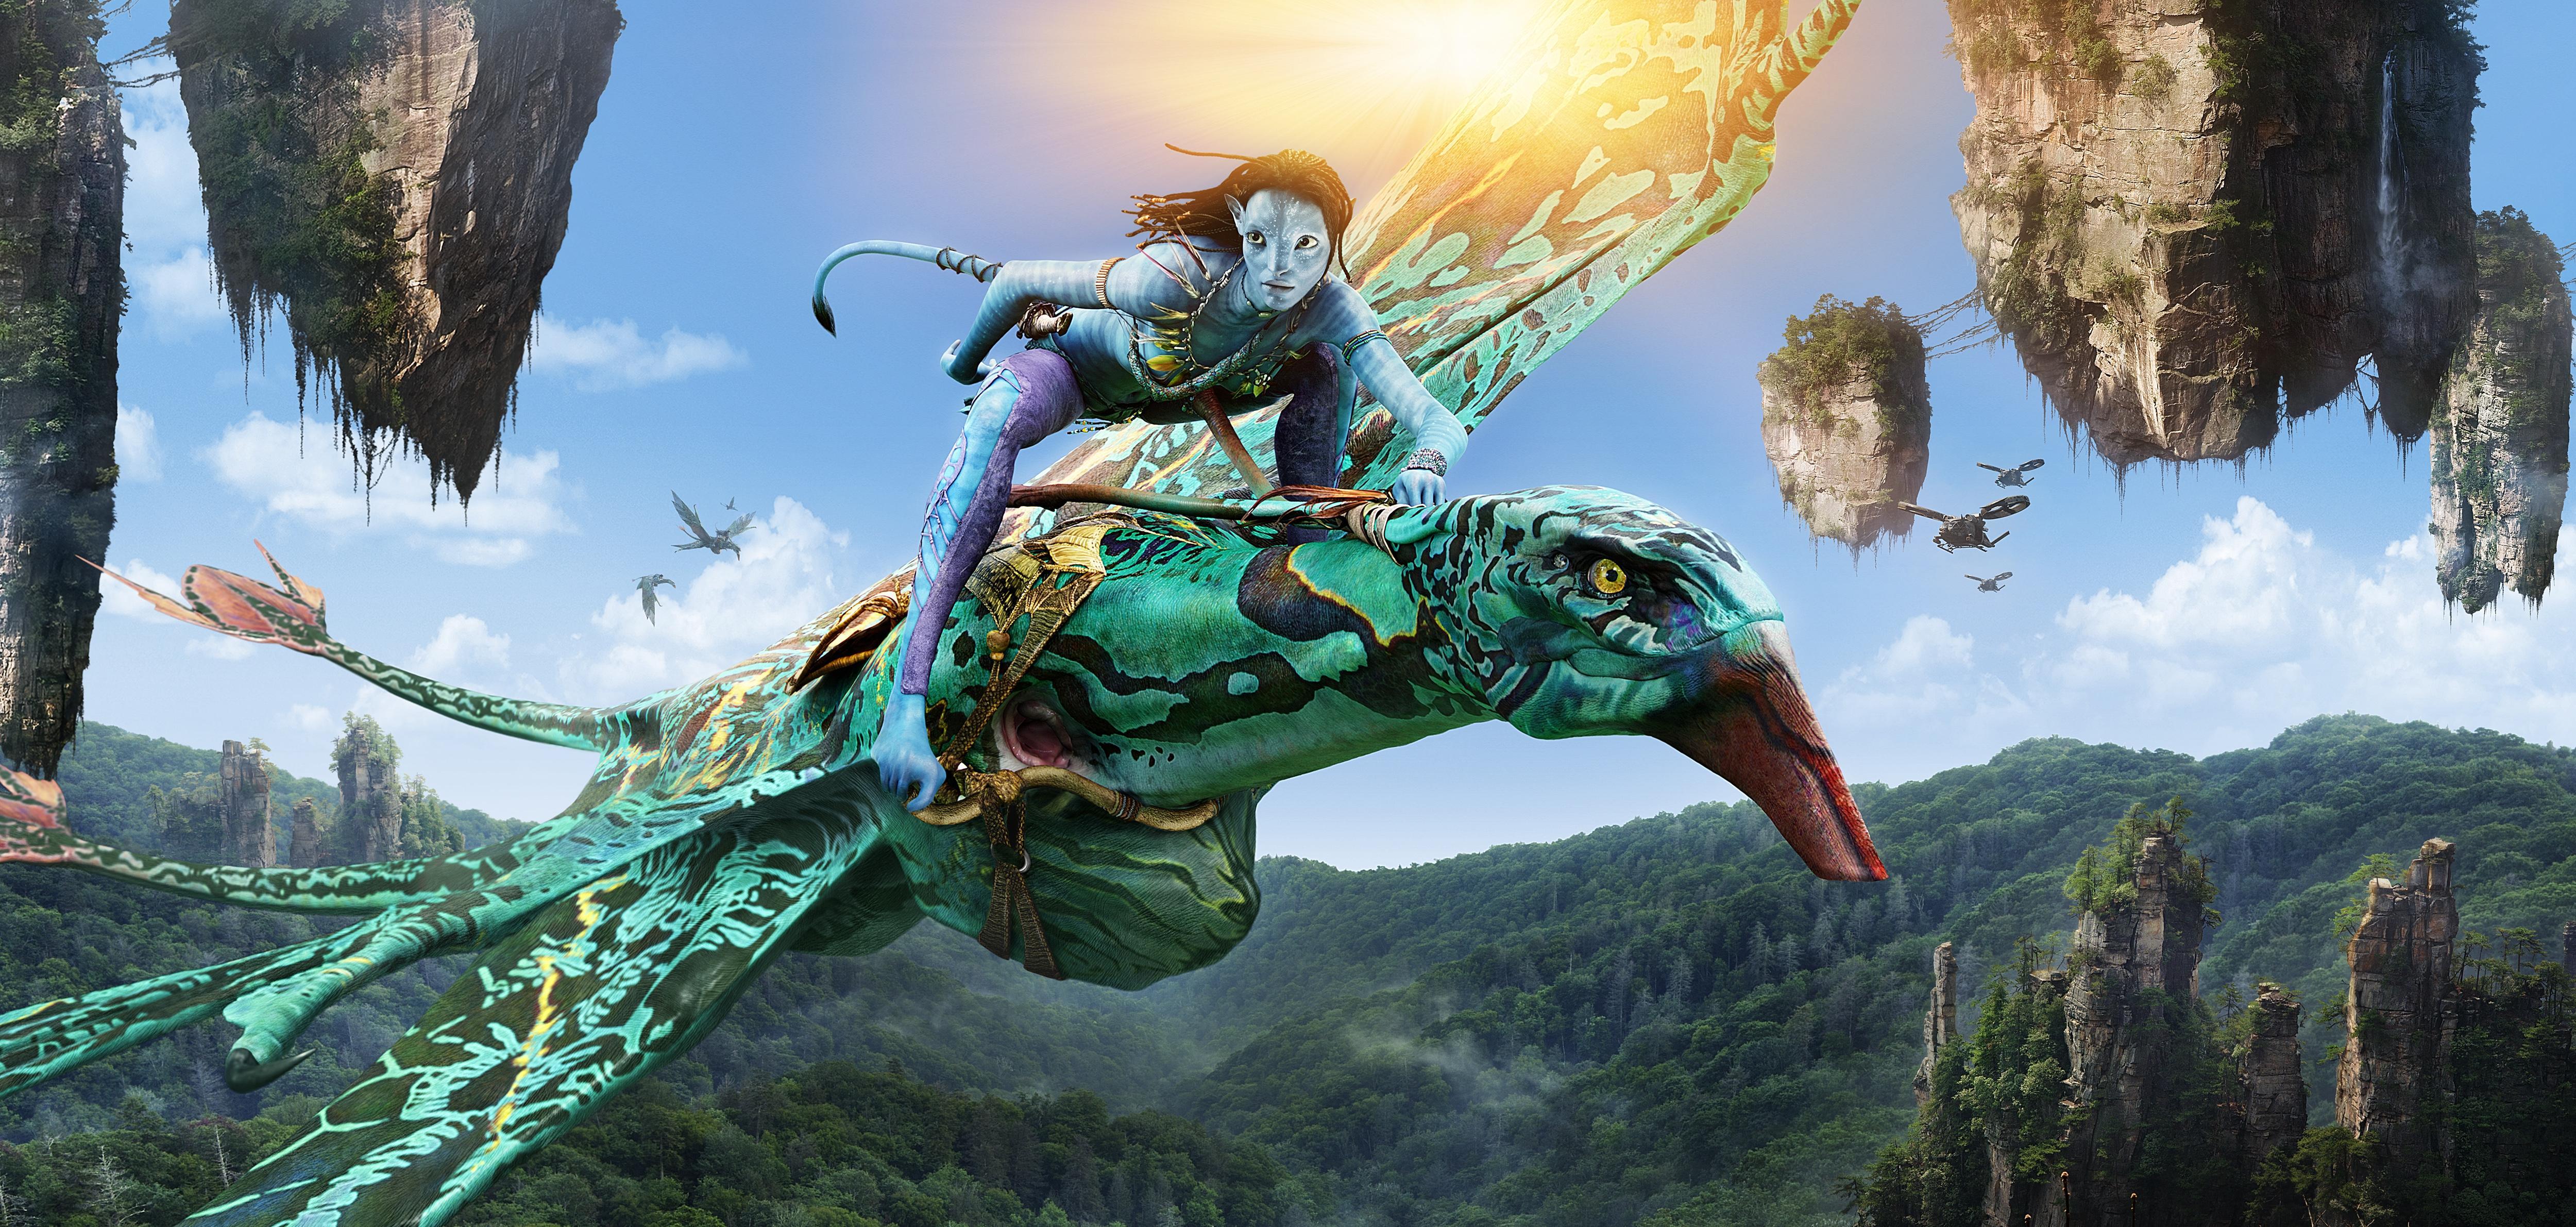 Avatar 4k Wallpapers Top Free Avatar 4k Backgrounds Wallpaperaccess